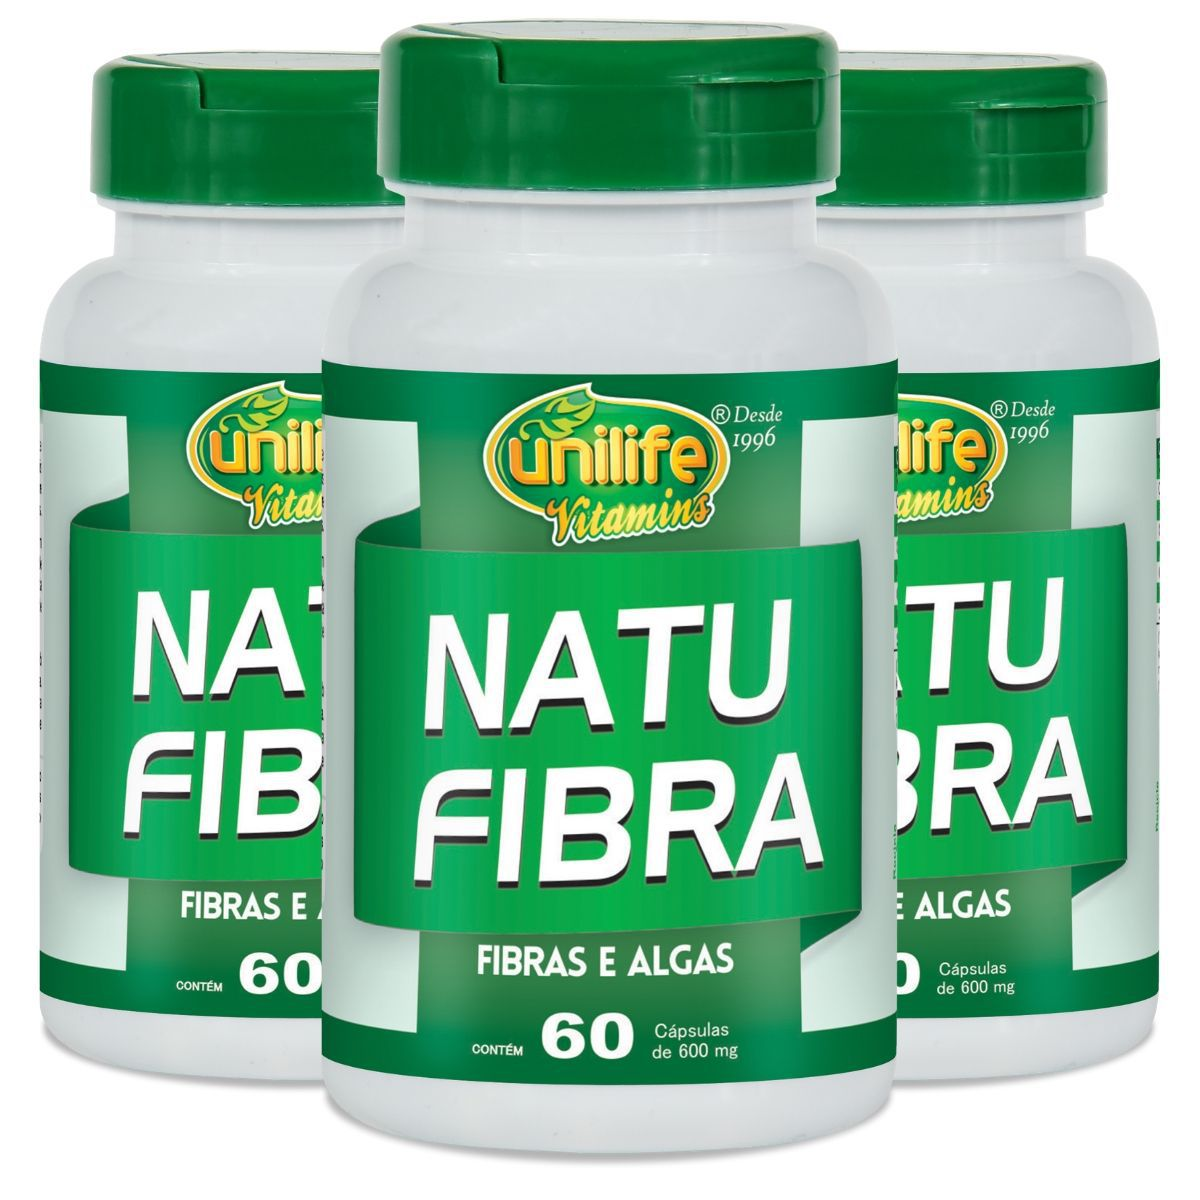 Kit 3 Natu Fibra Unilife Fibras e Algas - 600 Mg 60 cápsulas